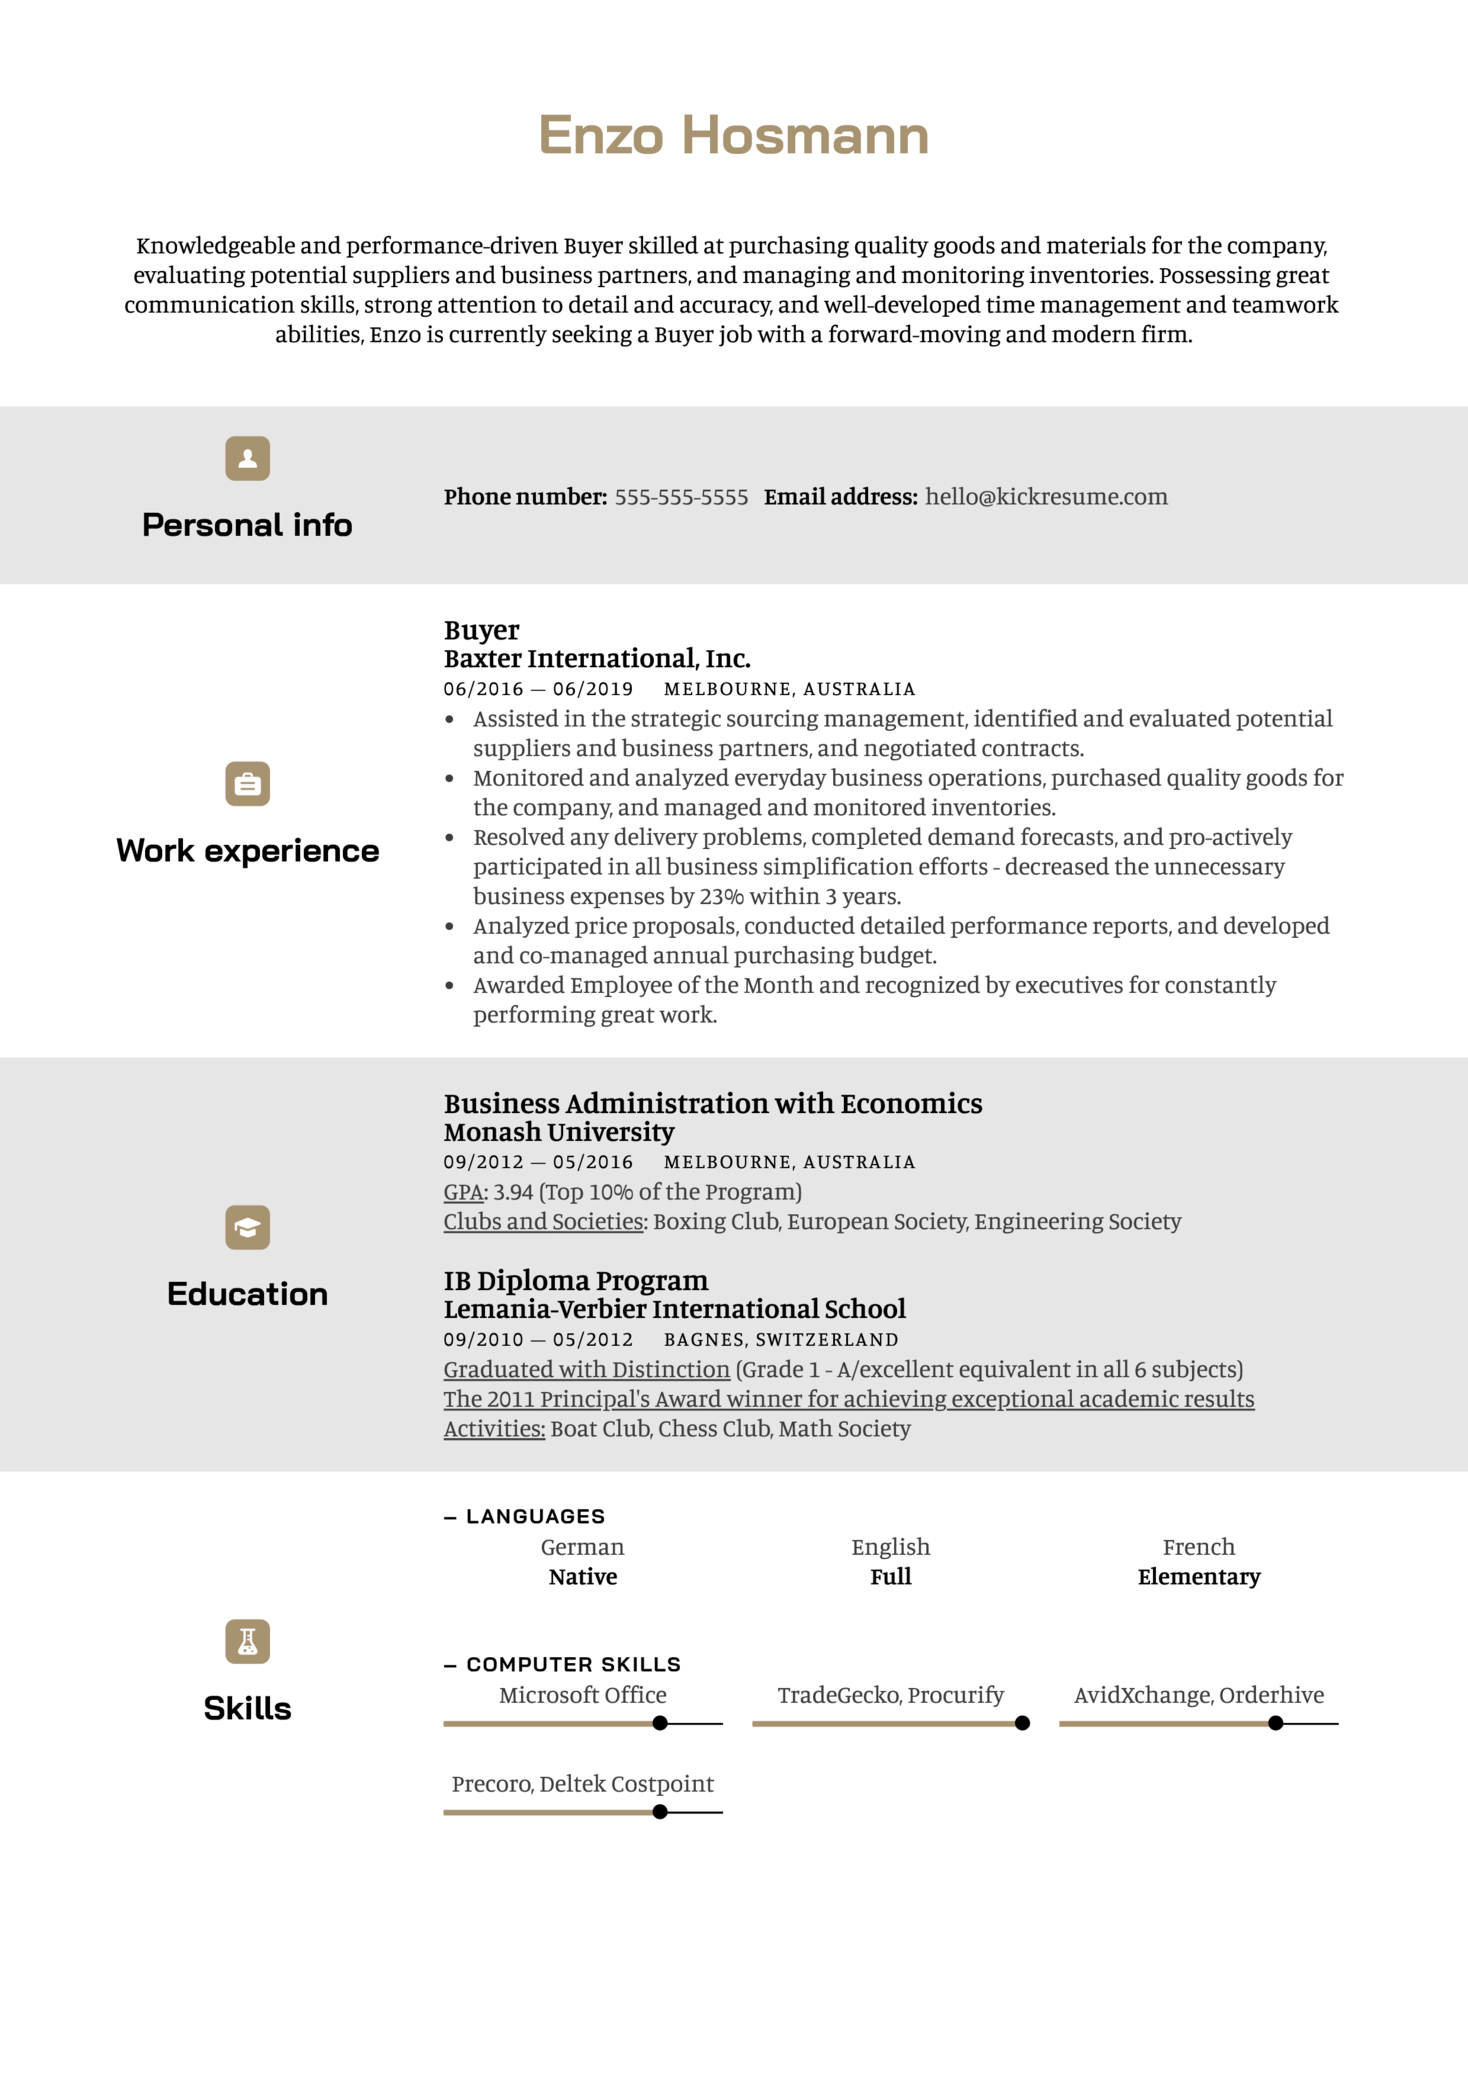 Buyer Resume Example (Part 1)